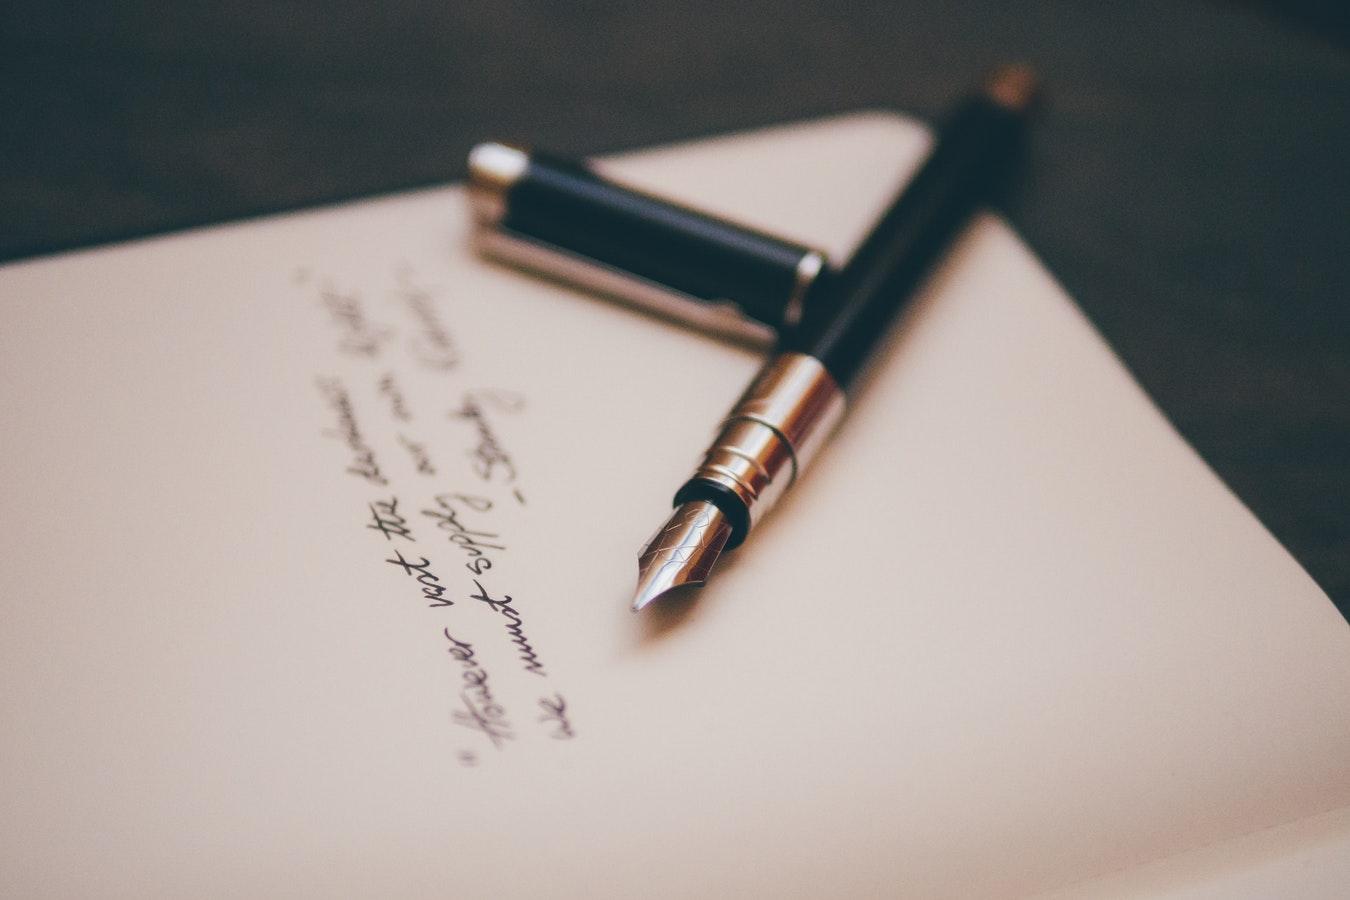 Poesie matrimonio, XLVIII sonetto di Pablo Neruda